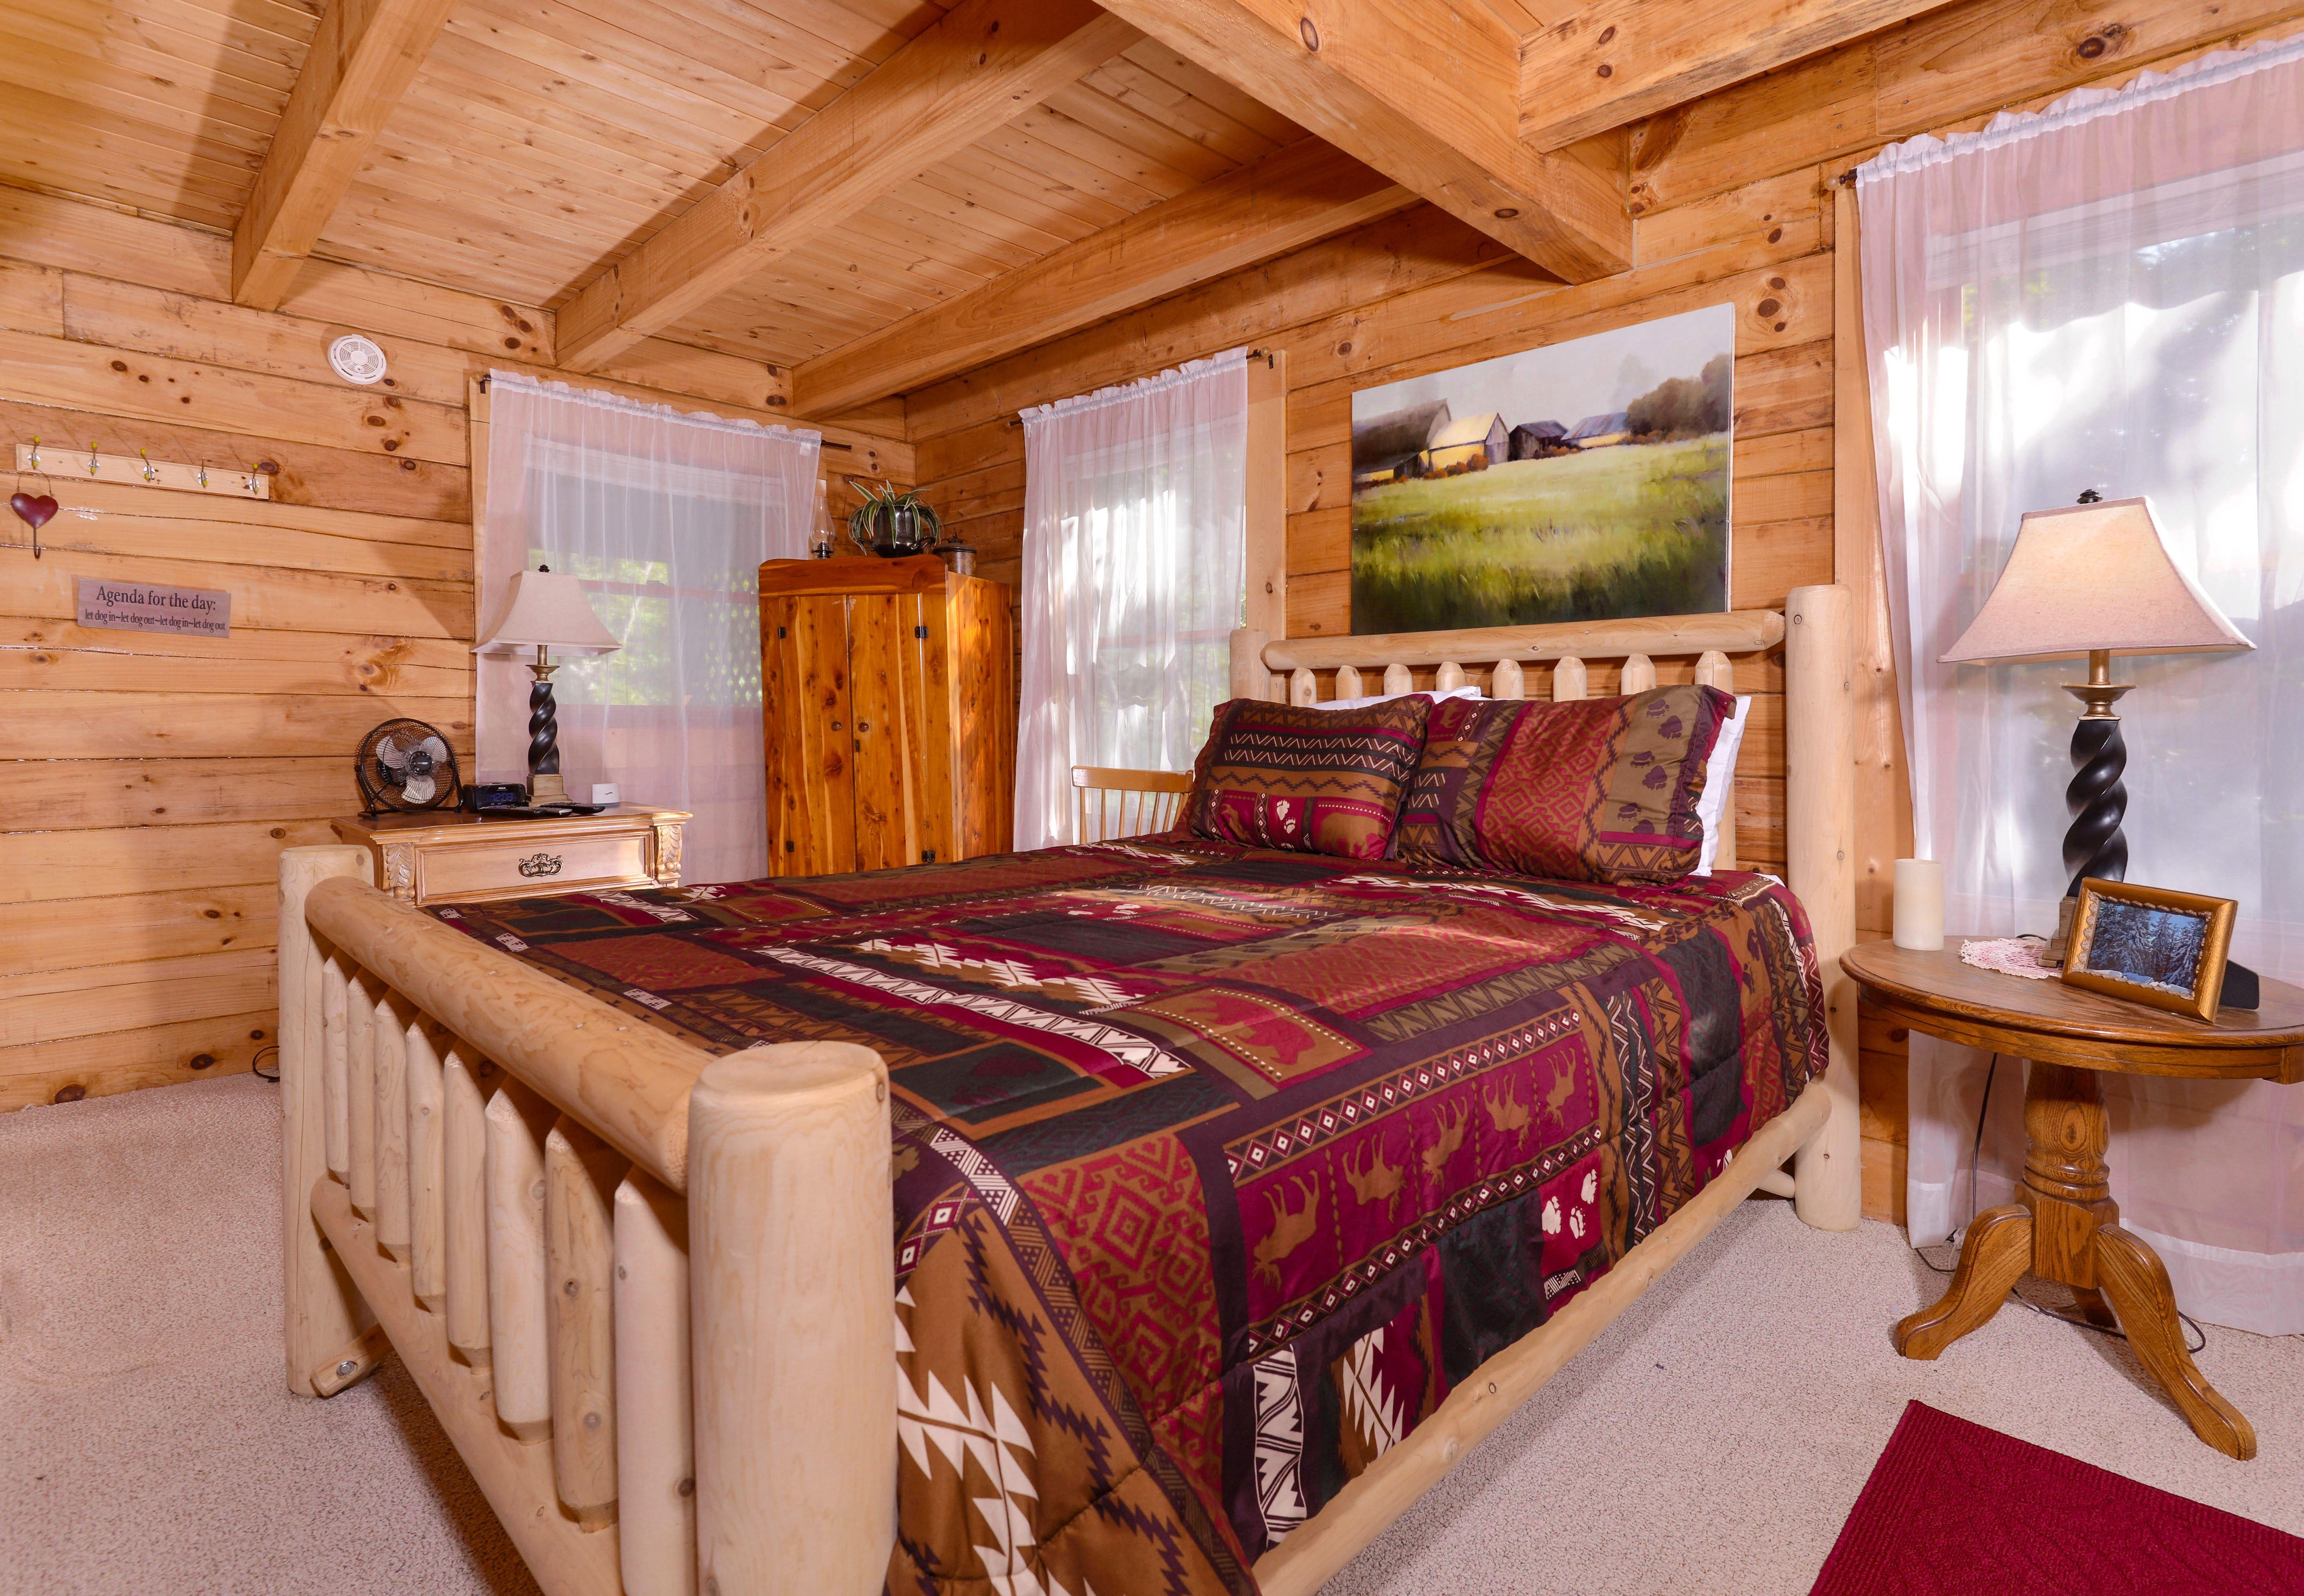 gatlinburg bear img news pi online tn s den bearsdengatlinburg cabins vacation